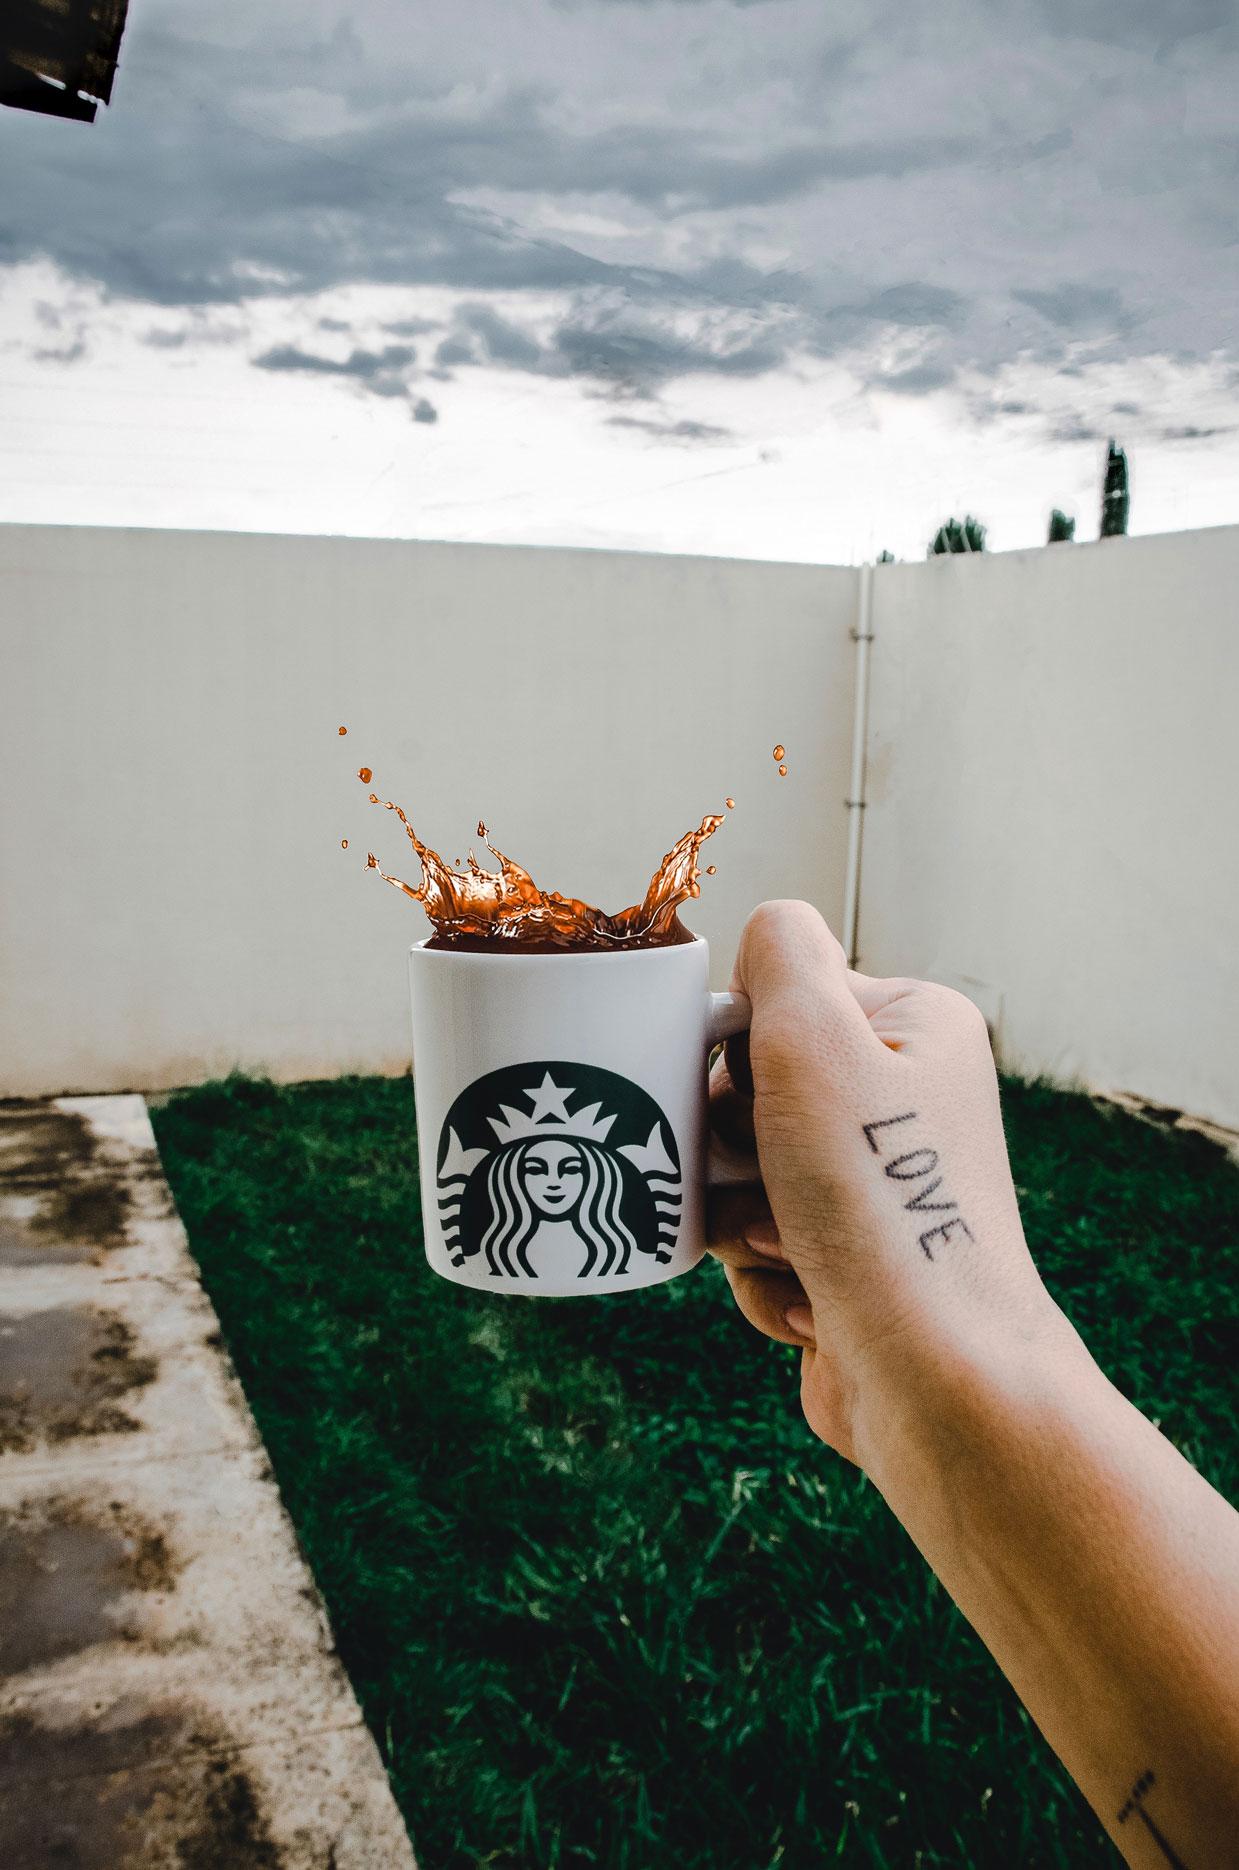 Starbucks u Srbiji; Stiže i novi trend! Foto: Isabella Mendes pexels.com